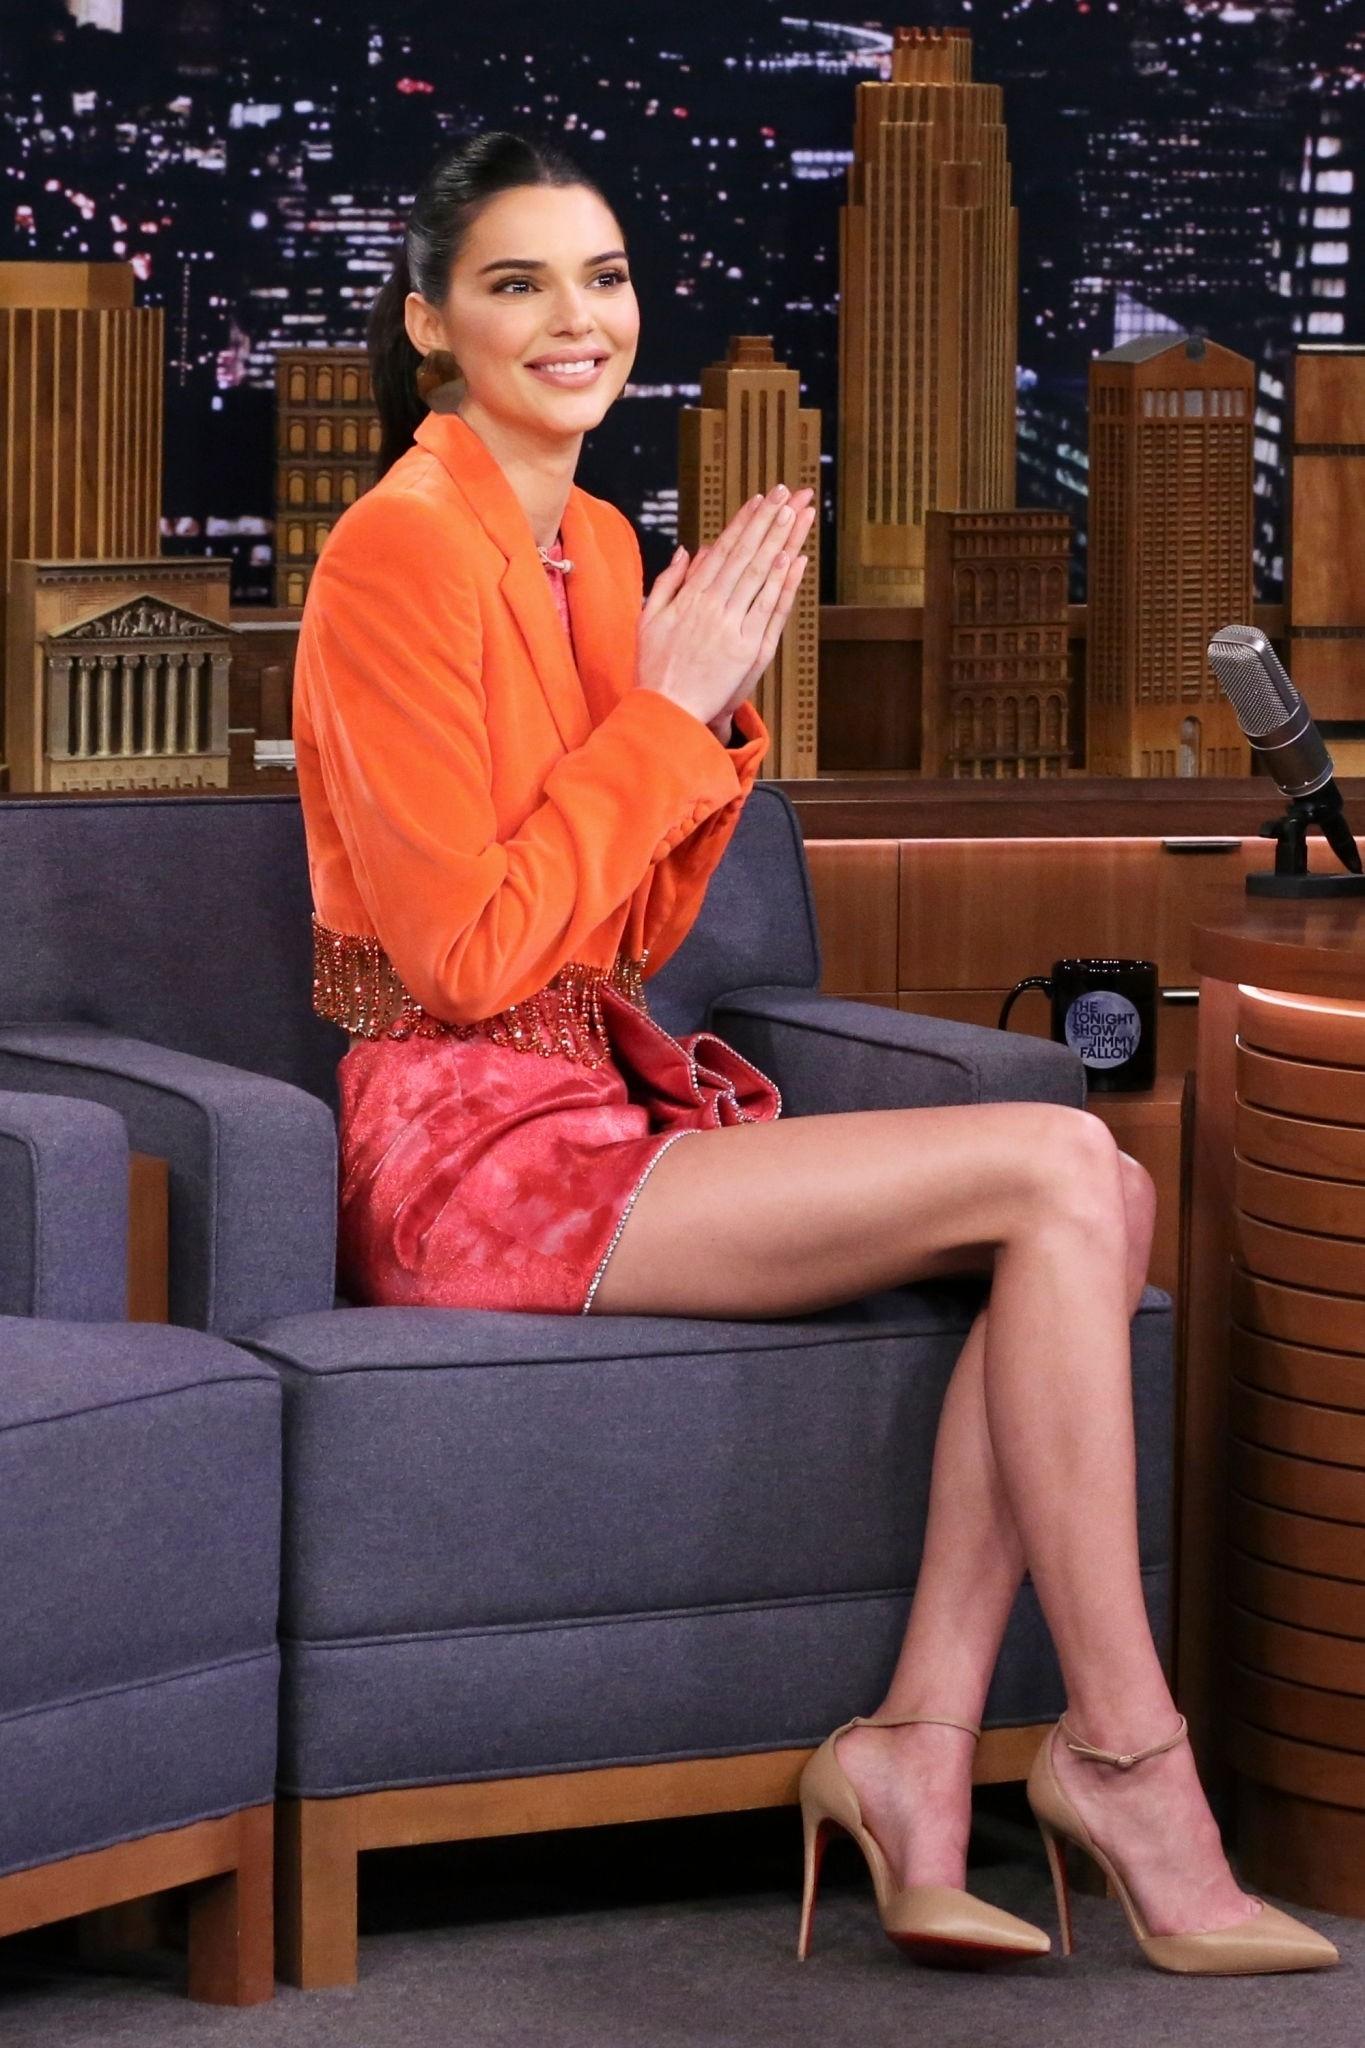 Feet Kendall Nicole Jenner naked (67 photo), Sexy, Paparazzi, Boobs, bra 2006